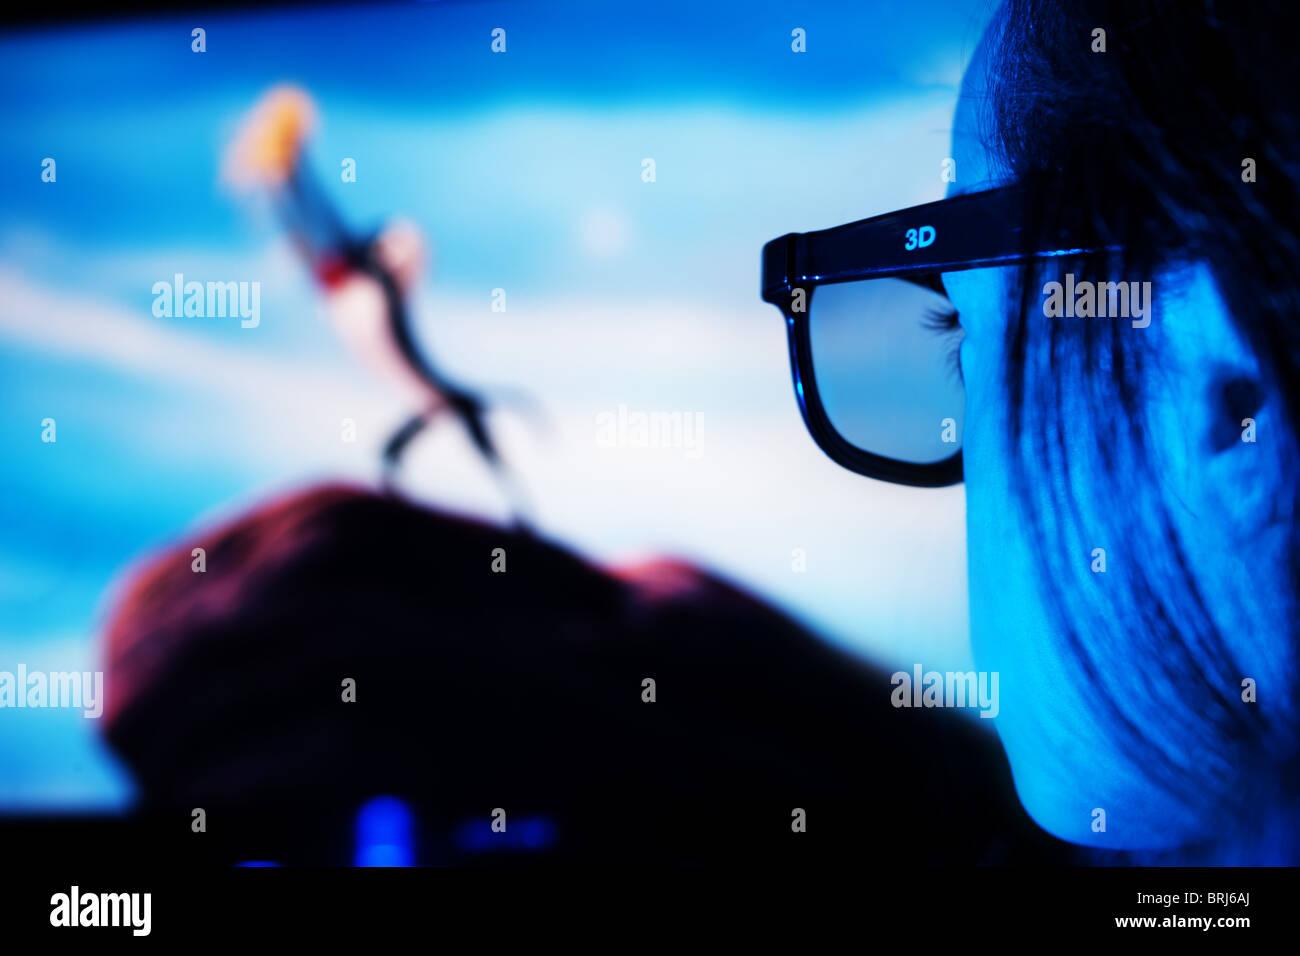 Entretenimiento en 3D Imagen De Stock